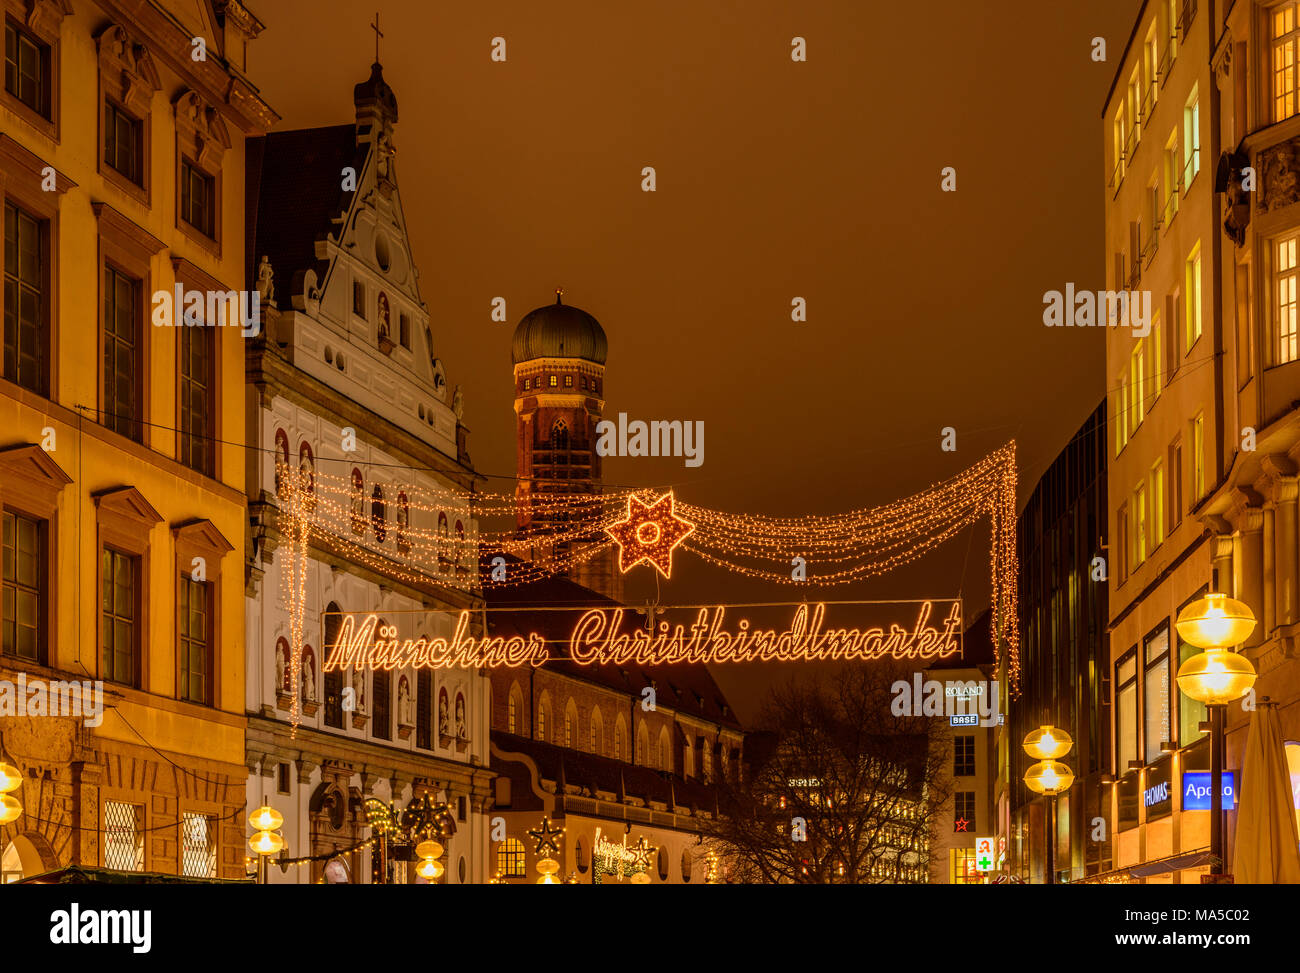 In Germania, in Baviera, Baviera, Monaco di Baviera, Neuhauser Strasse, Fiera di Natale, Michaelskirche (chiesa) e Frauenkirche (chiesa) Immagini Stock